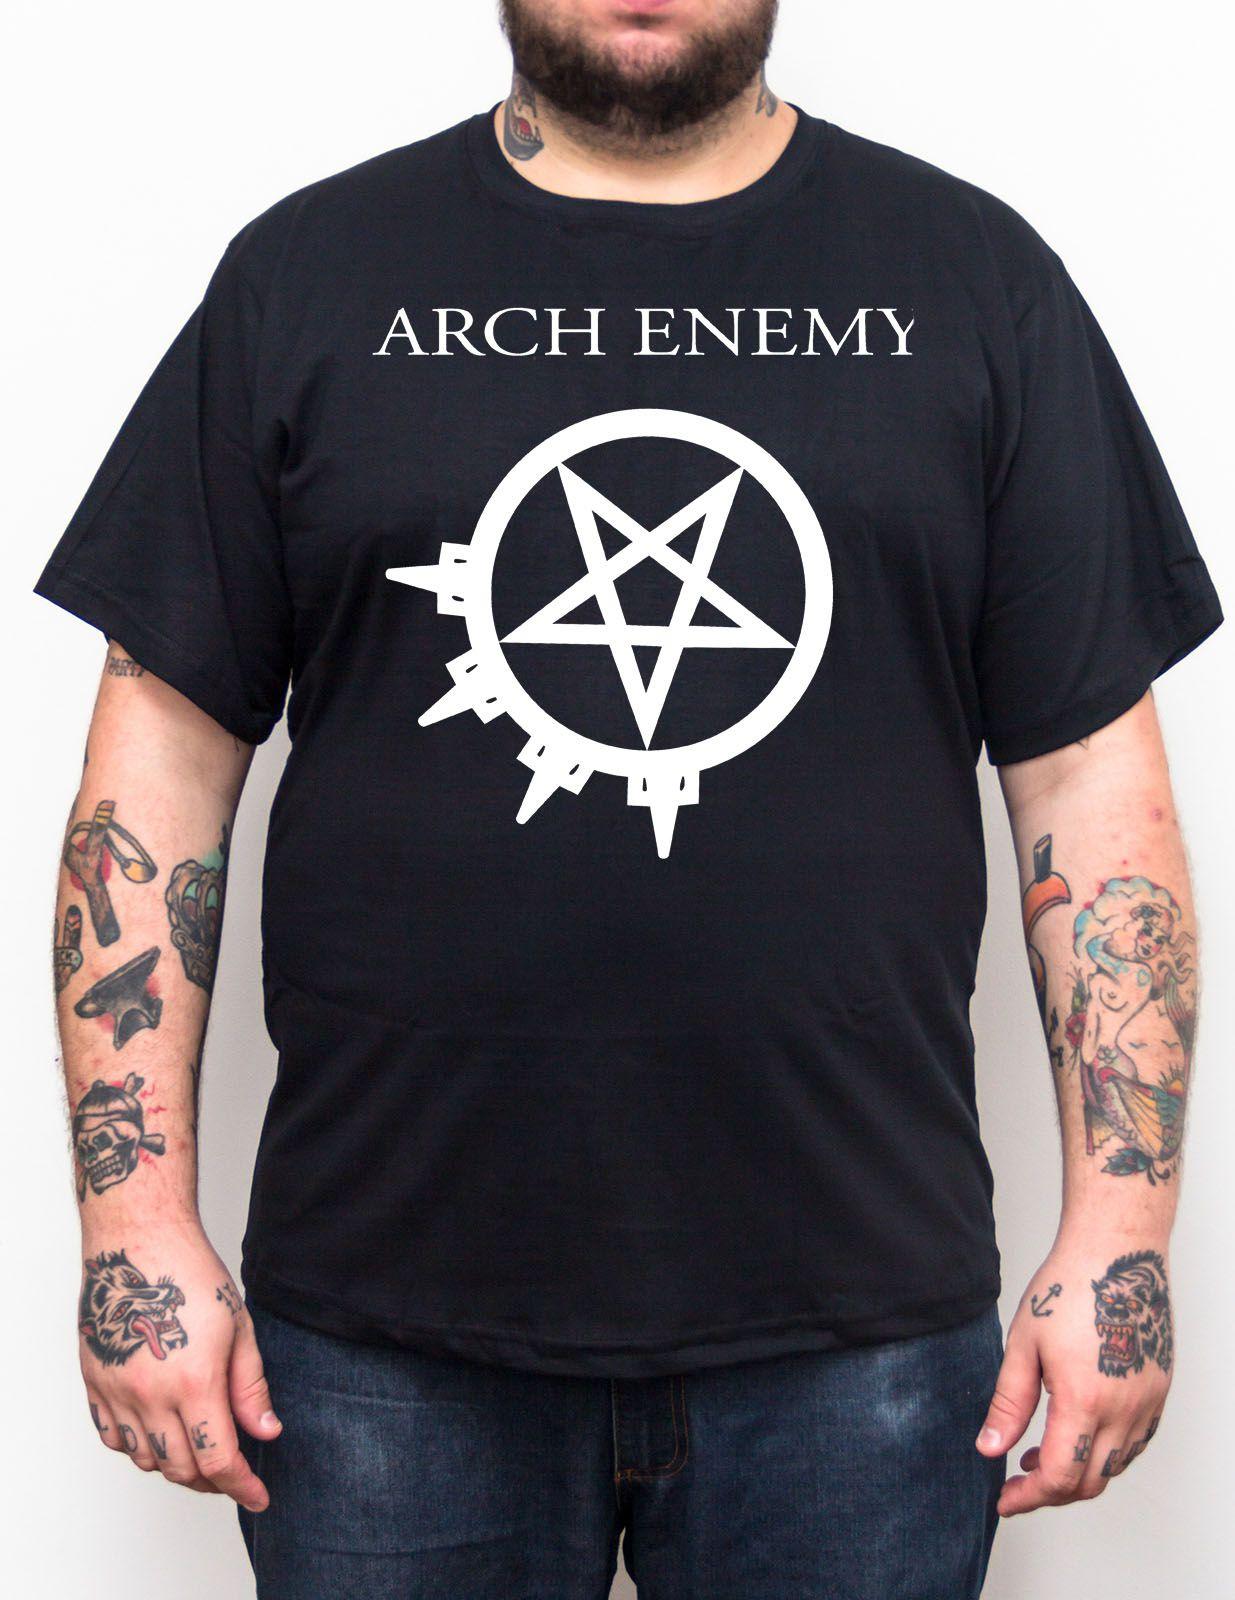 Camiseta Arch Enemy - Preto - Plus Size - Tamanho Grande Xg  - HShop